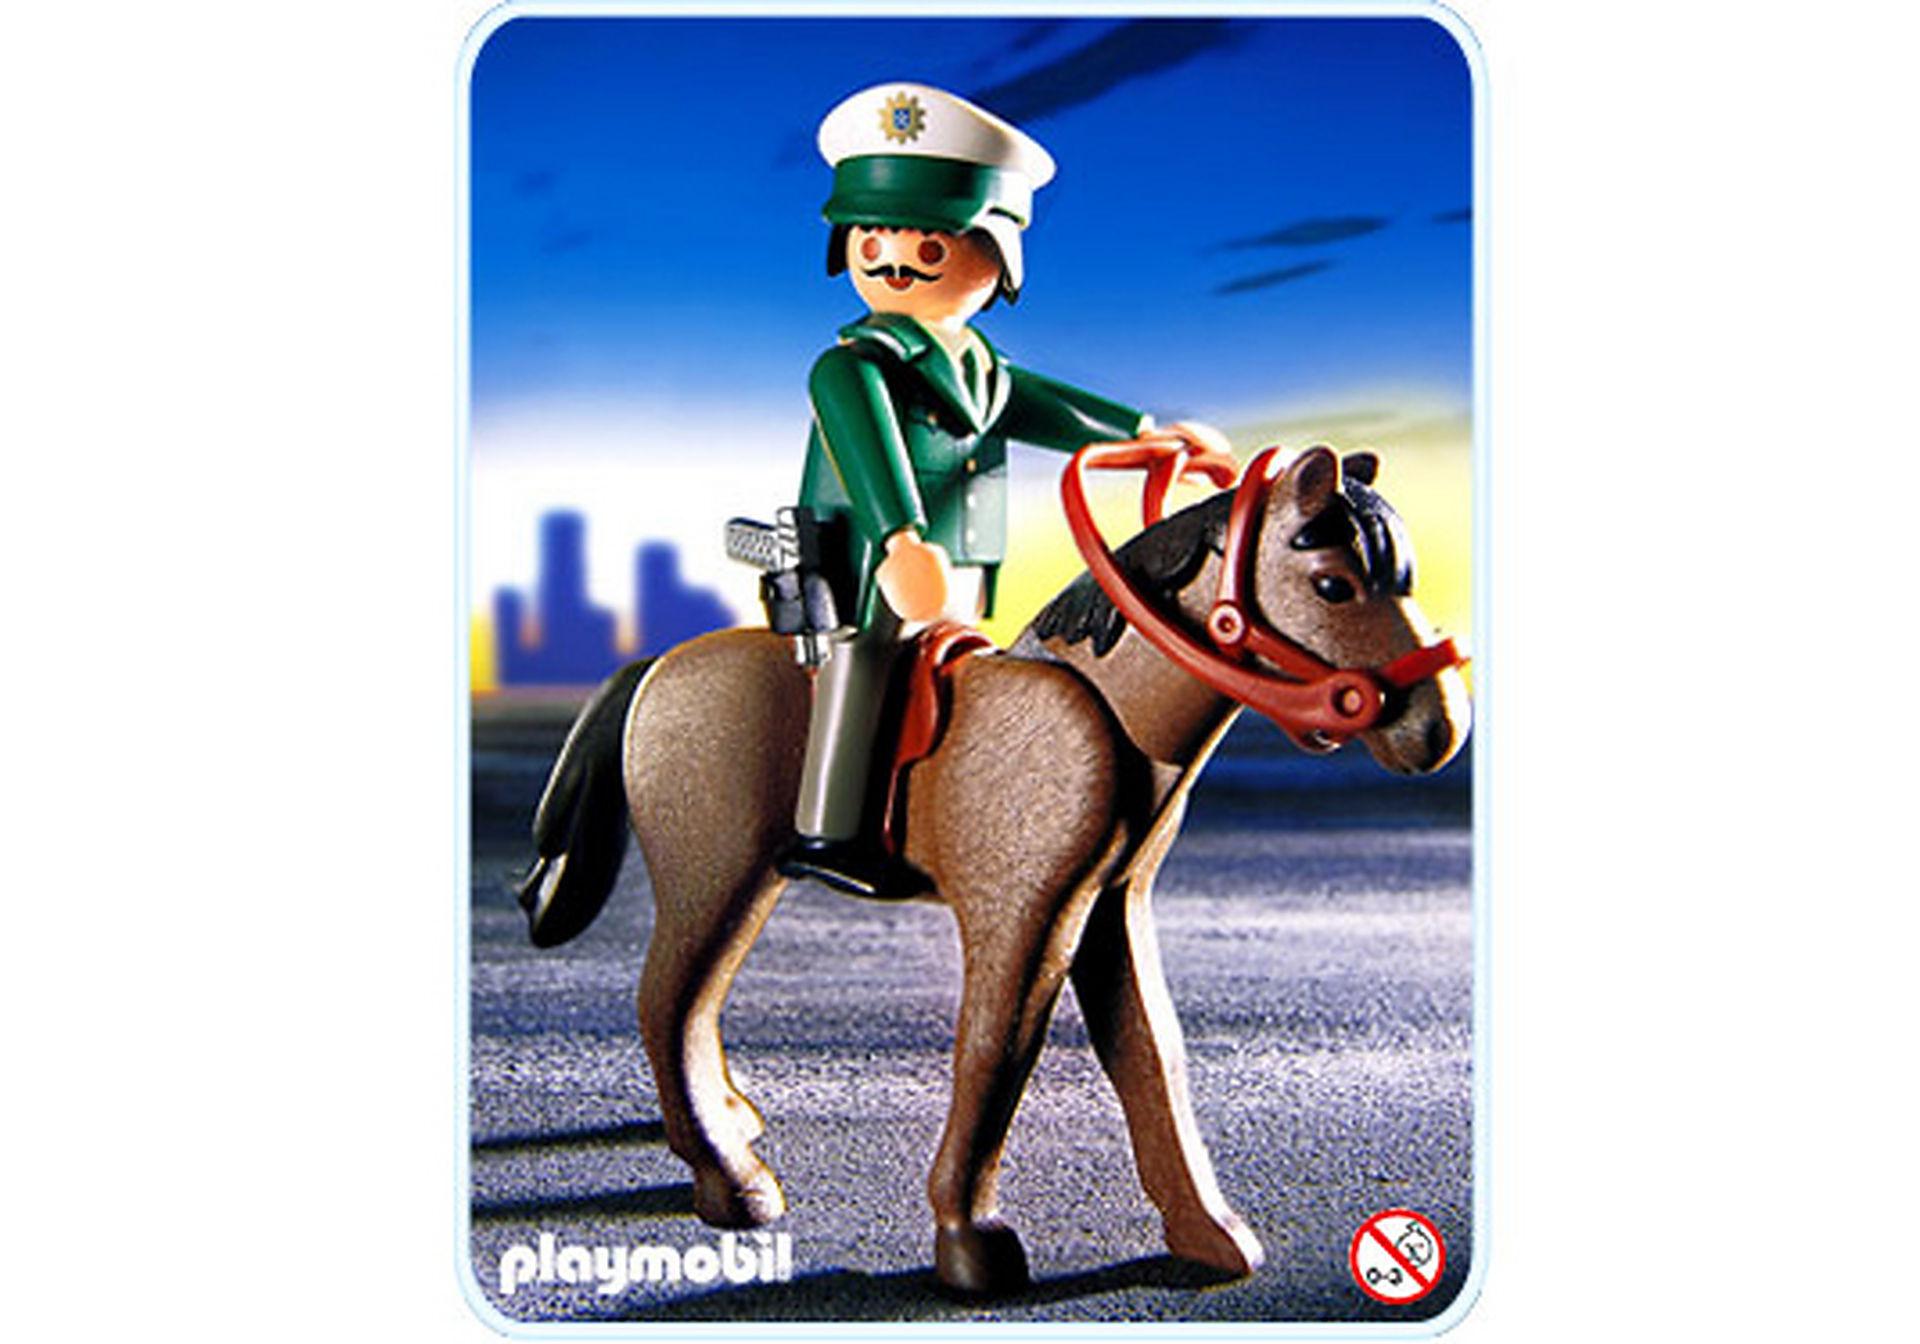 http://media.playmobil.com/i/playmobil/3163-A_product_detail/Polizist mit Pferd